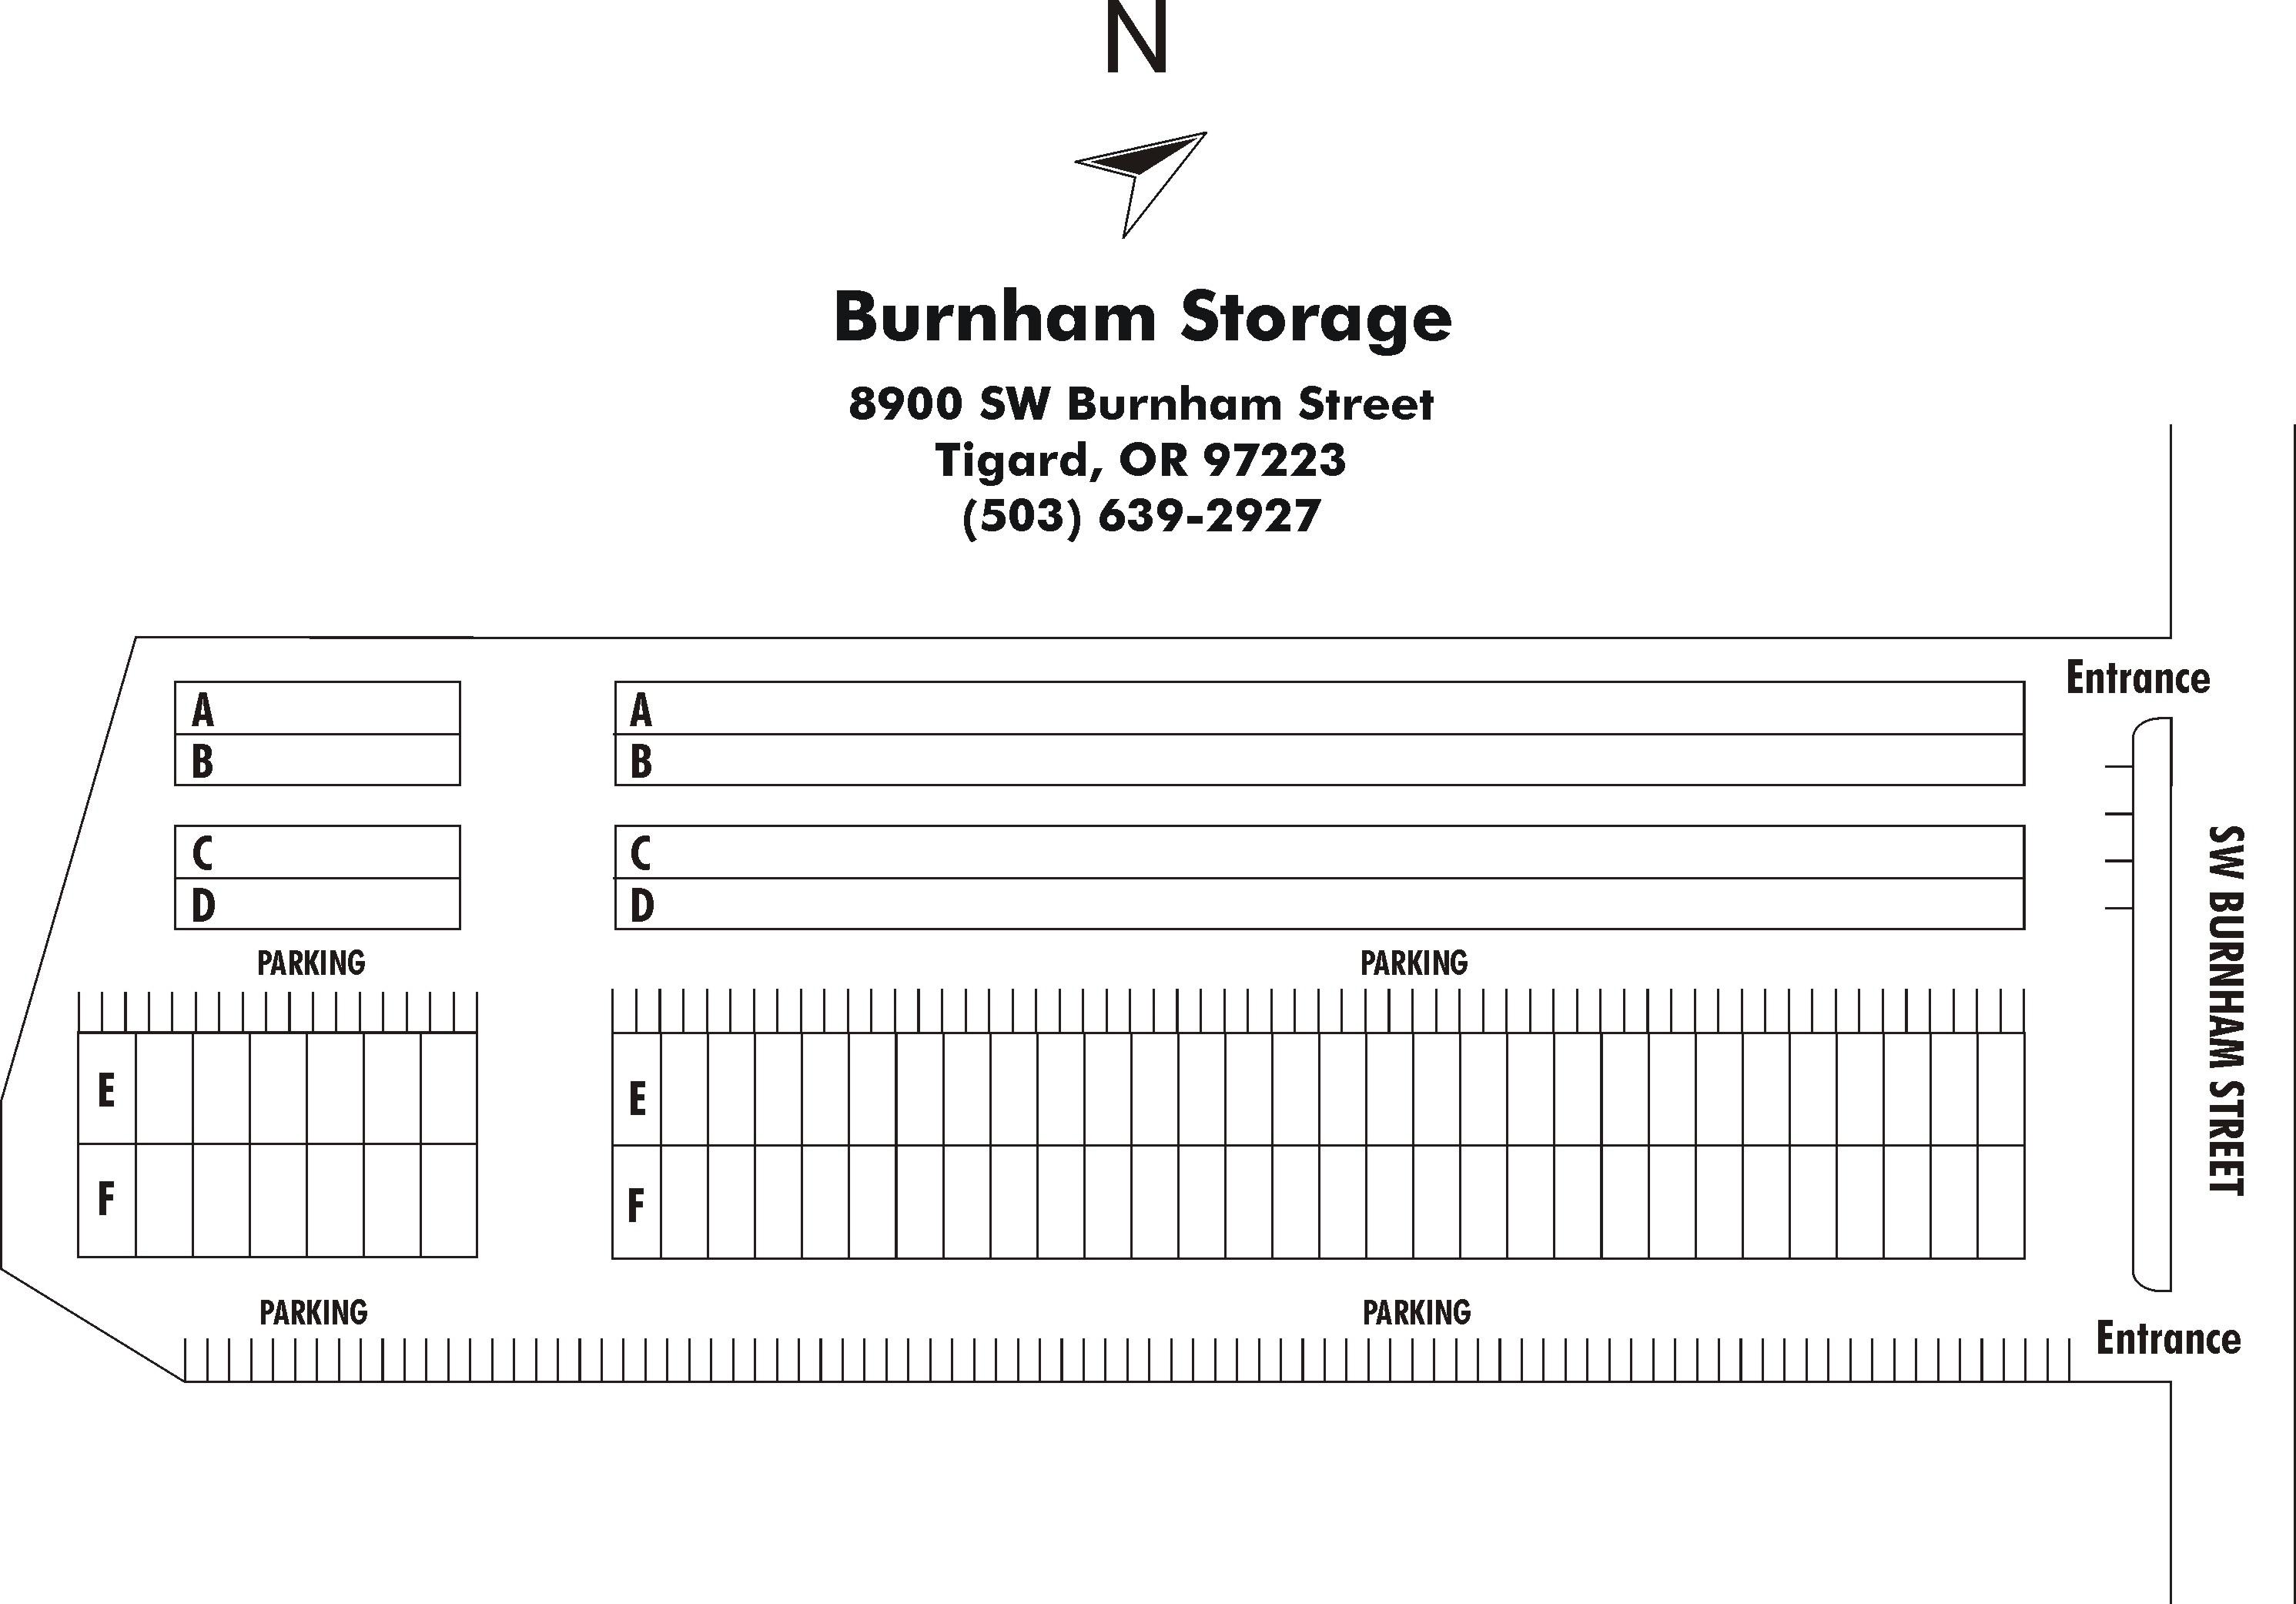 Burnham Business and Storage property map